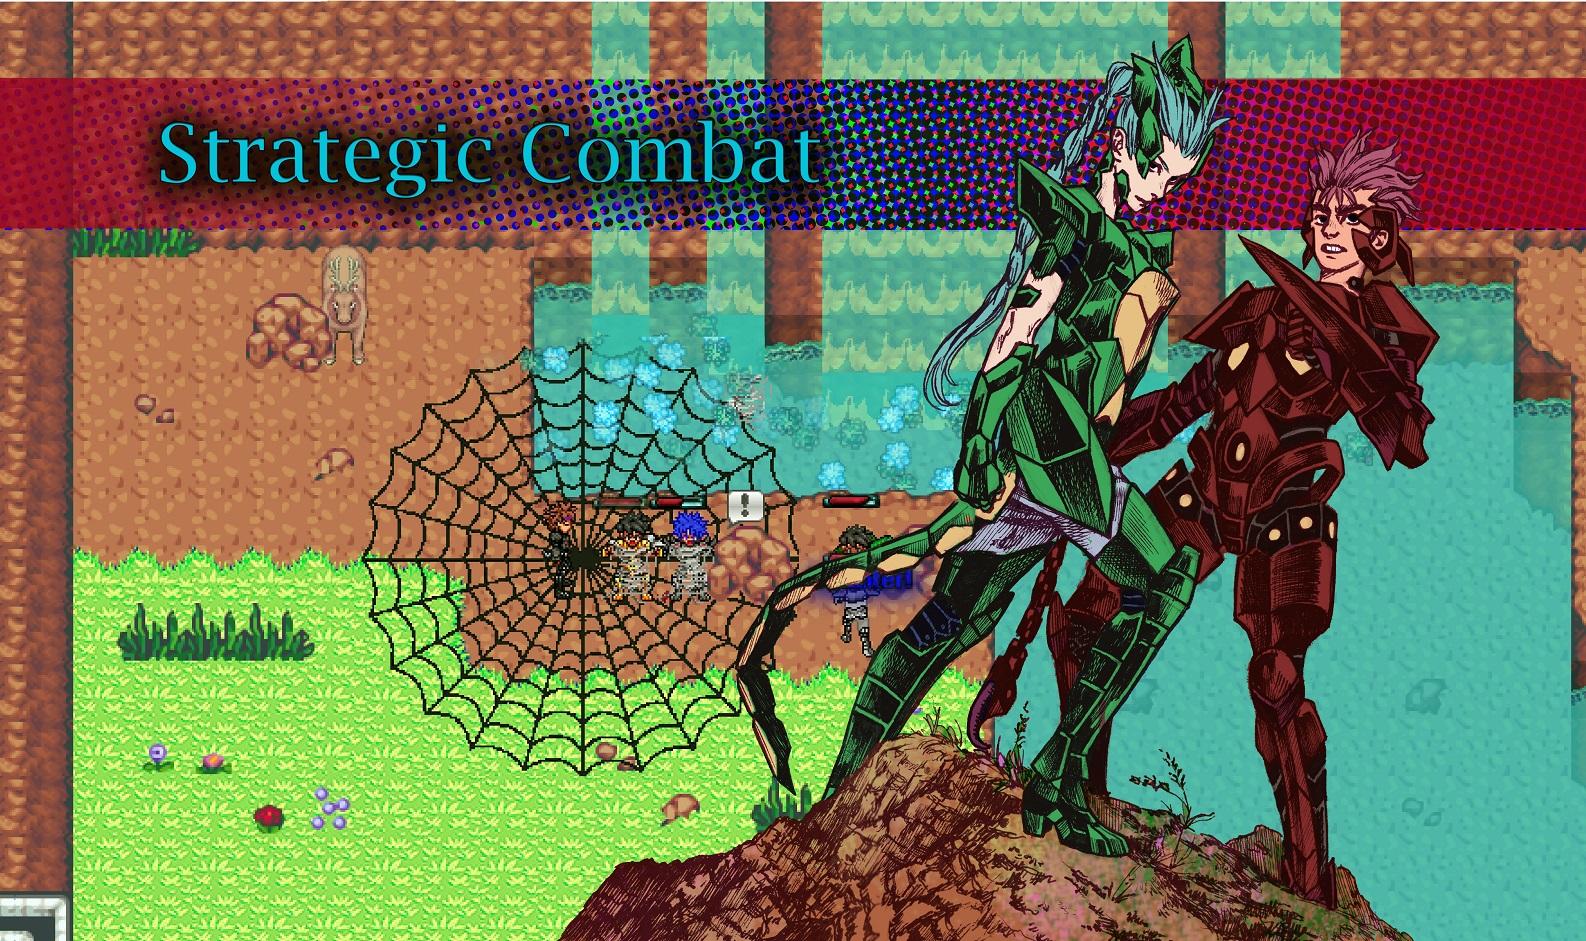 StrategicCombatLOW.jpg